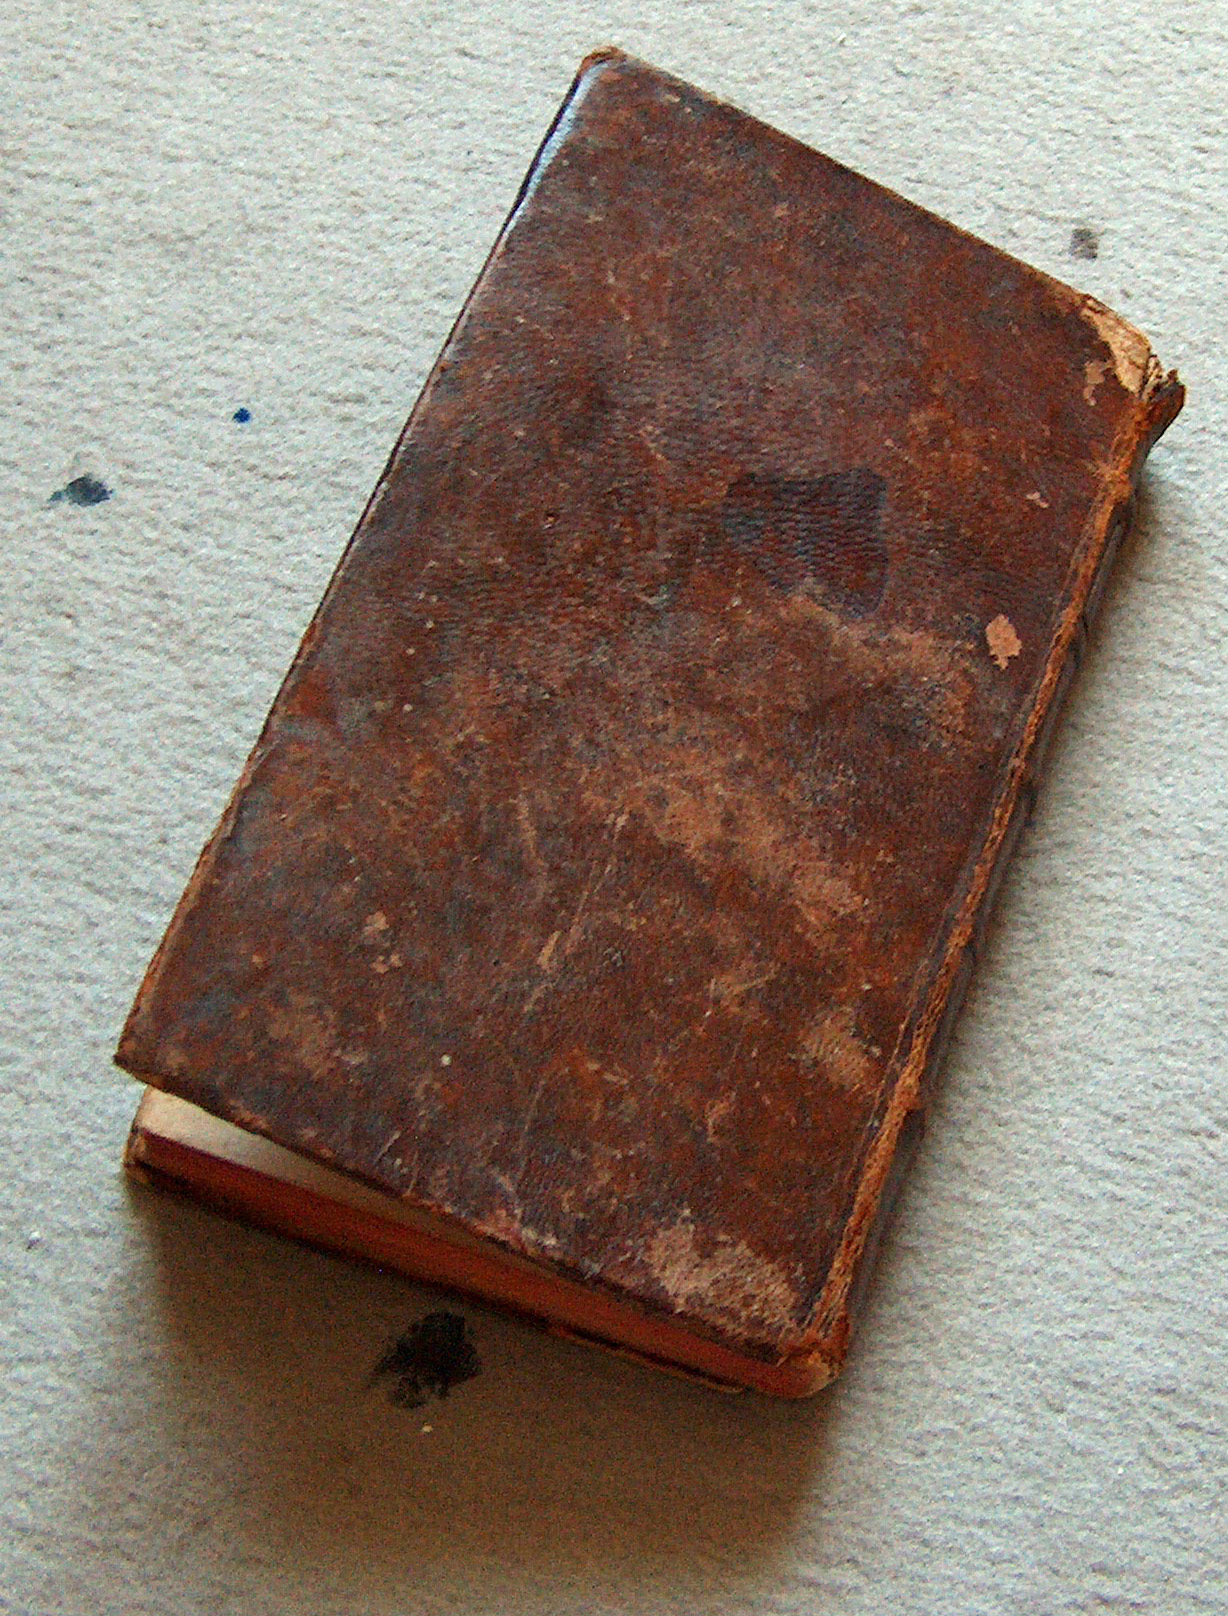 book18 by ArabellaDream-stock